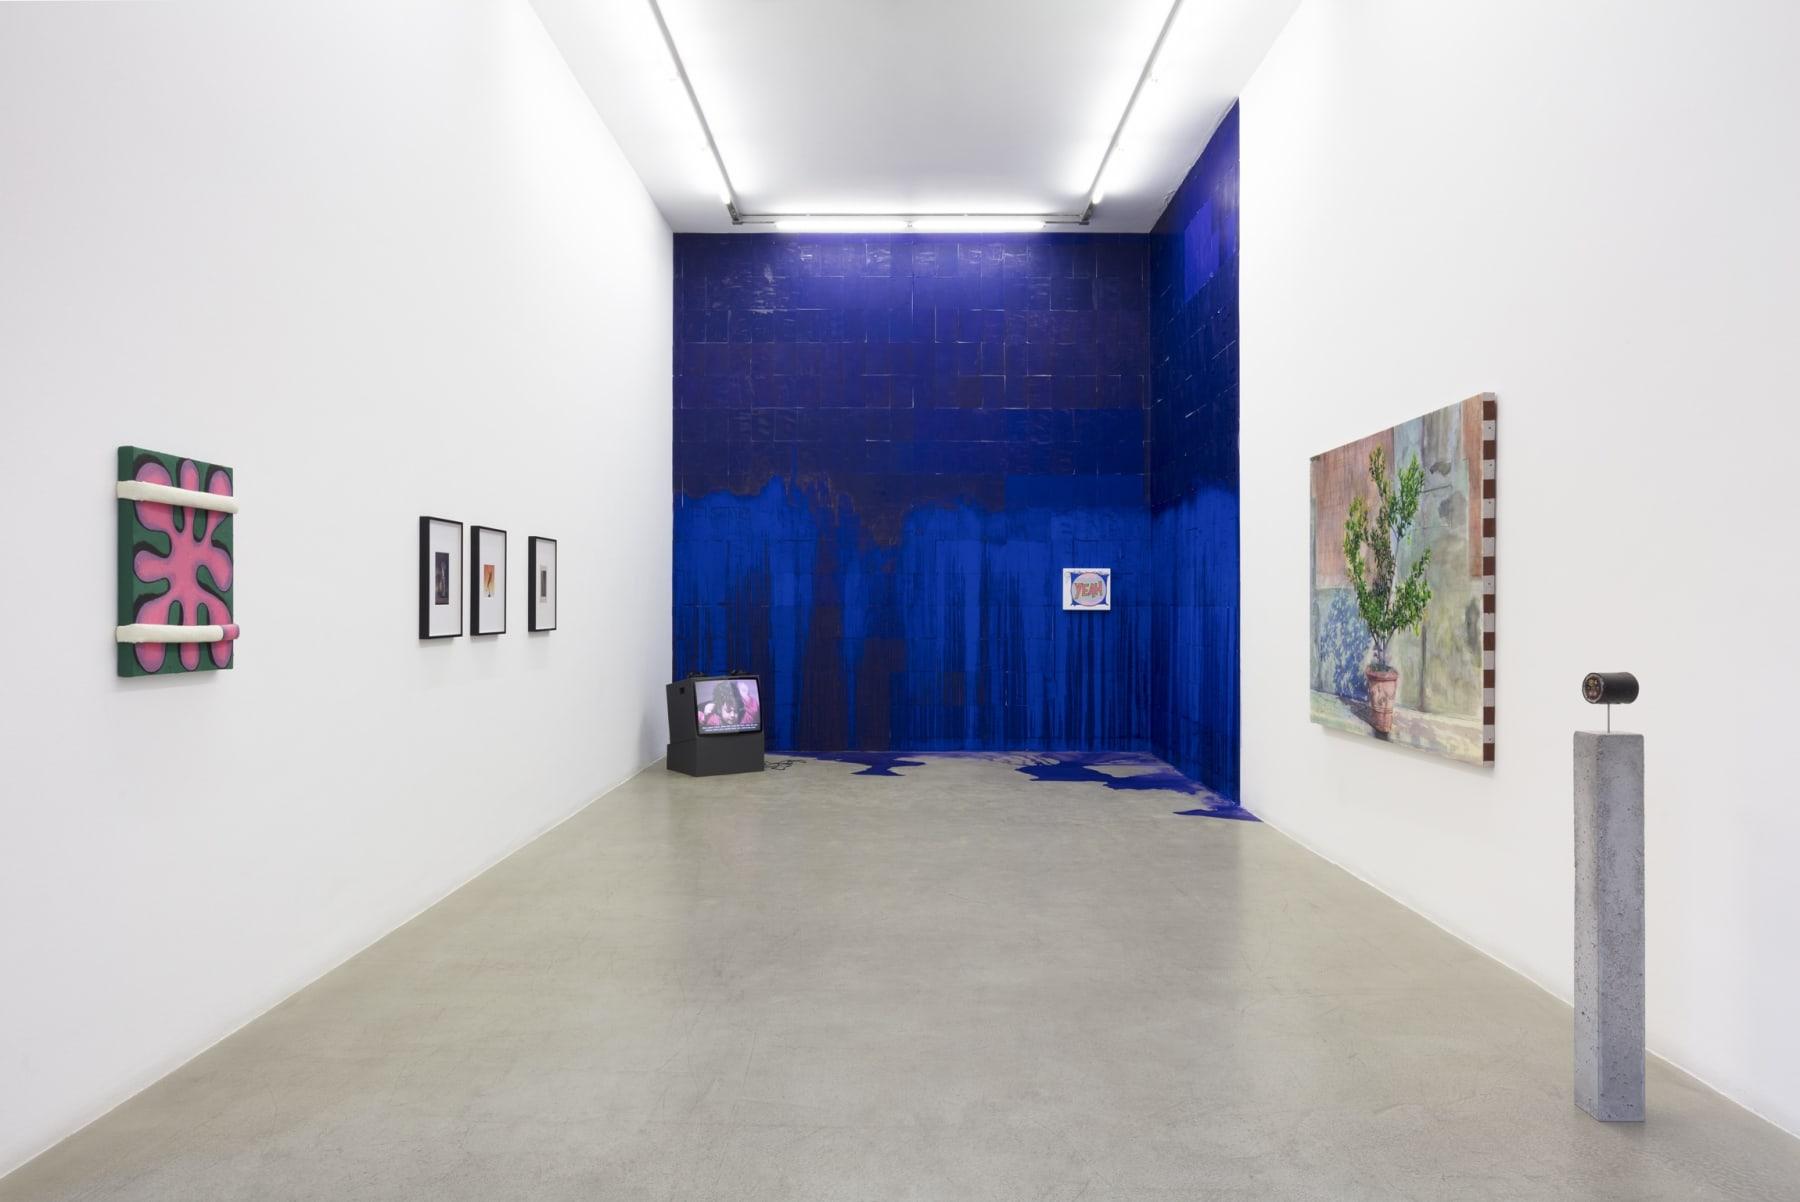 installation view, kaufmann repetto, milan